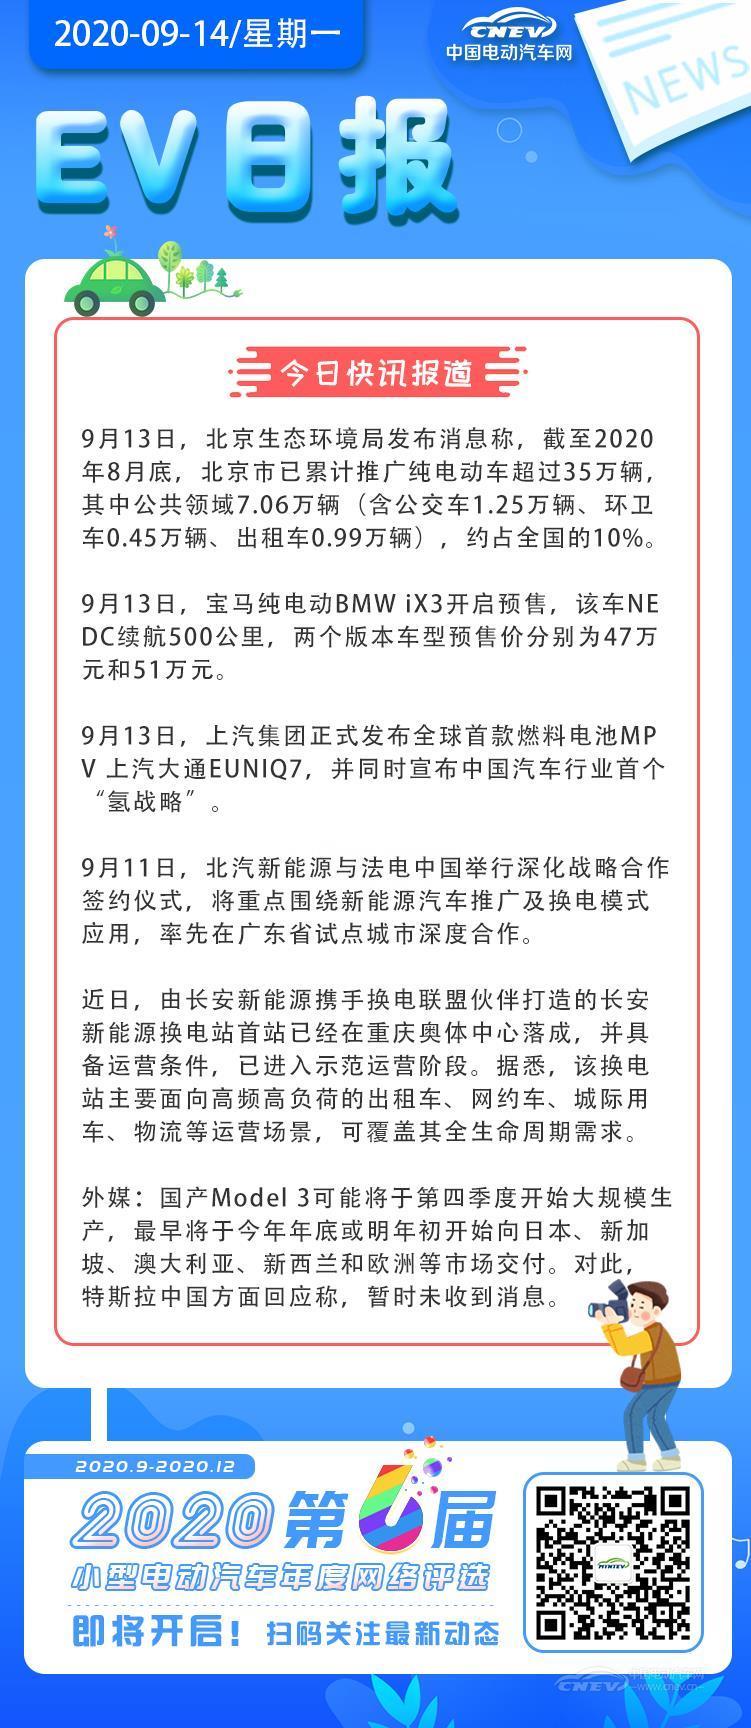 CNEV日报 丨 北京累计推广纯电动车超过35万辆,宝马纯电动BMW iX3……